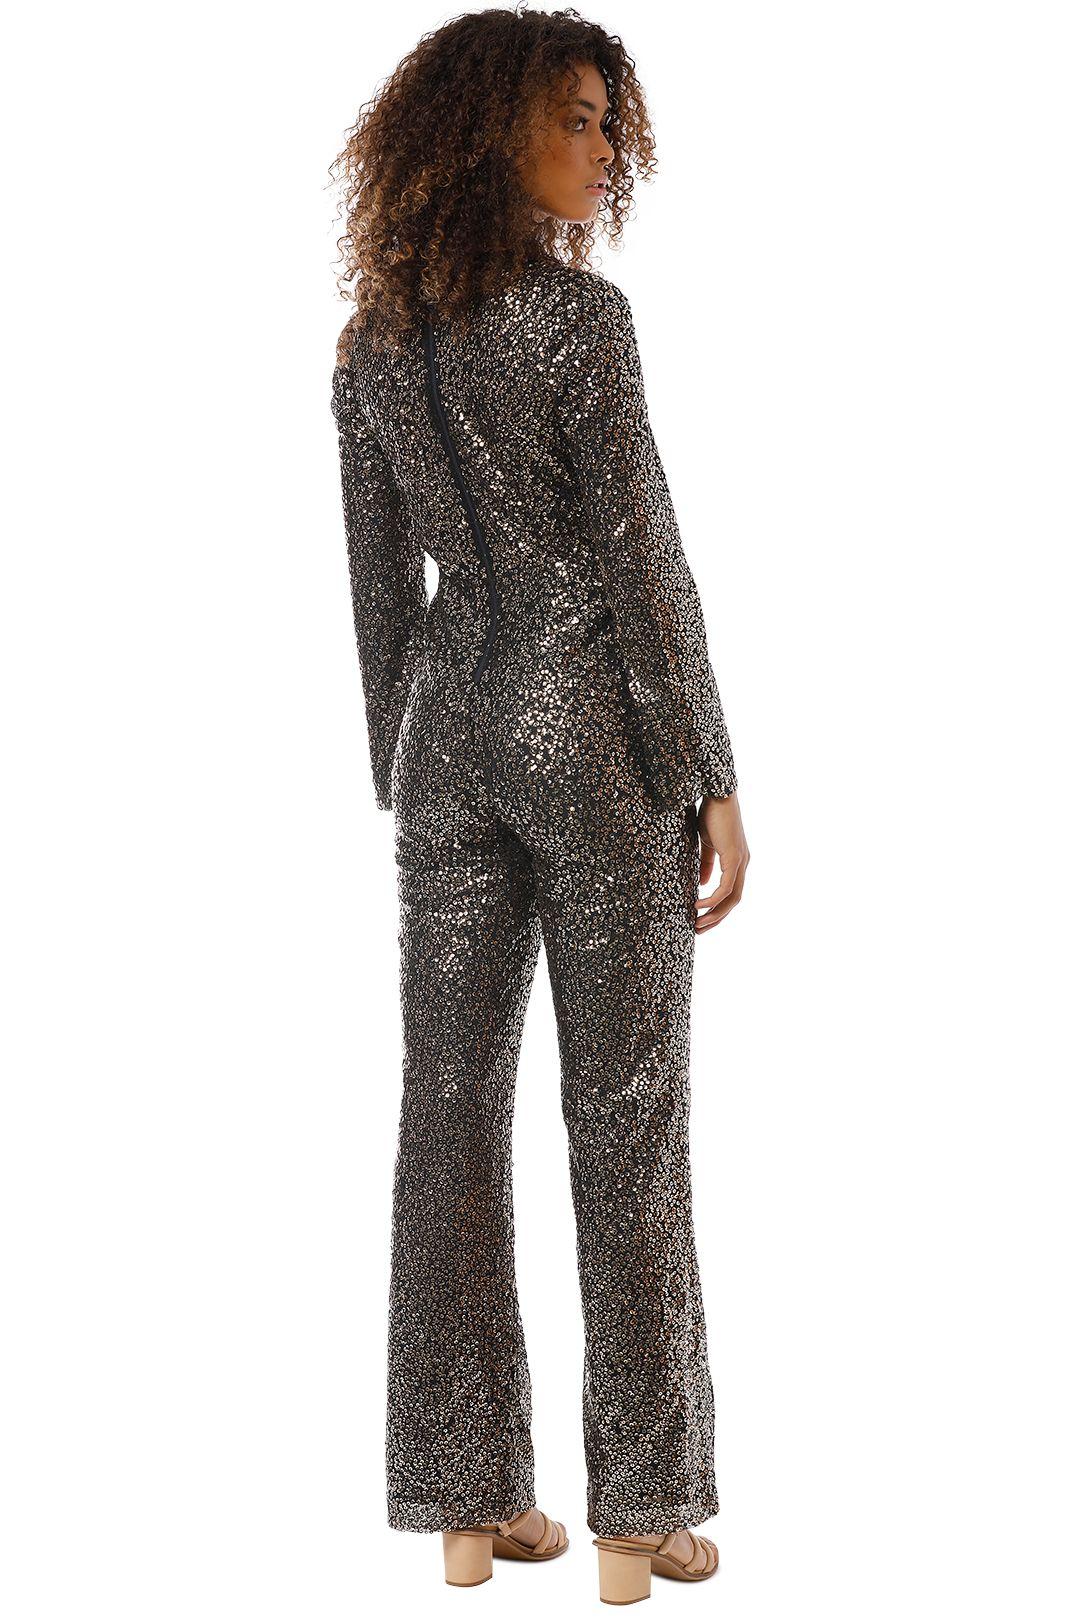 Misha Collection - Sharnie Pantsuit - Black Gold - Back